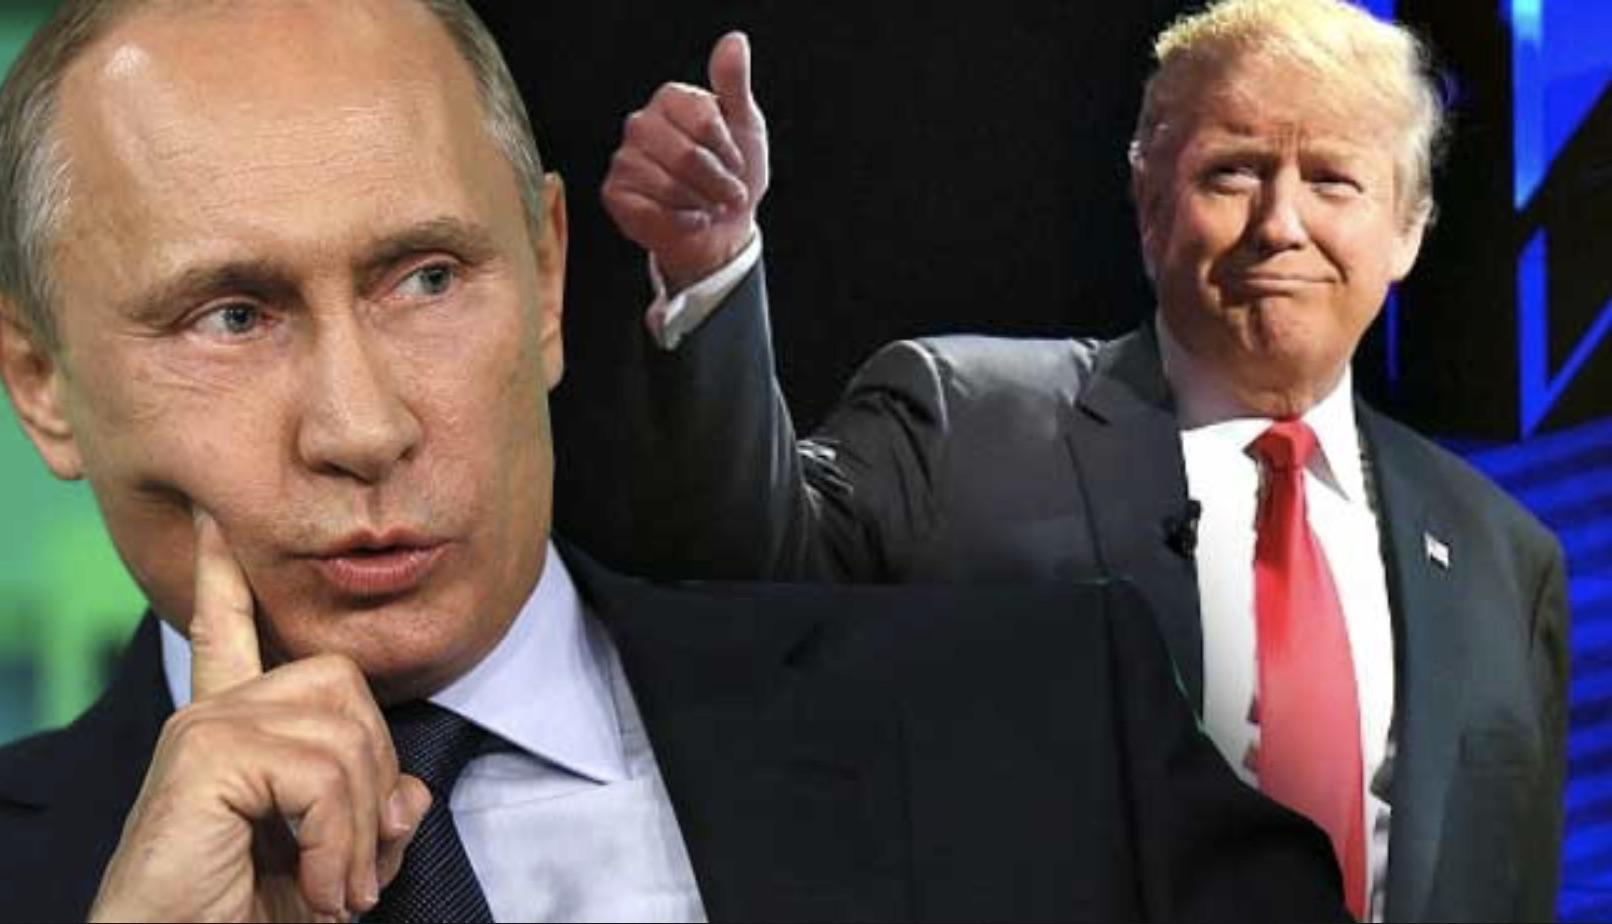 king-world-news-paul-craig-roberts-washington-pushing-the-world-to-war-can-trump-stop-it